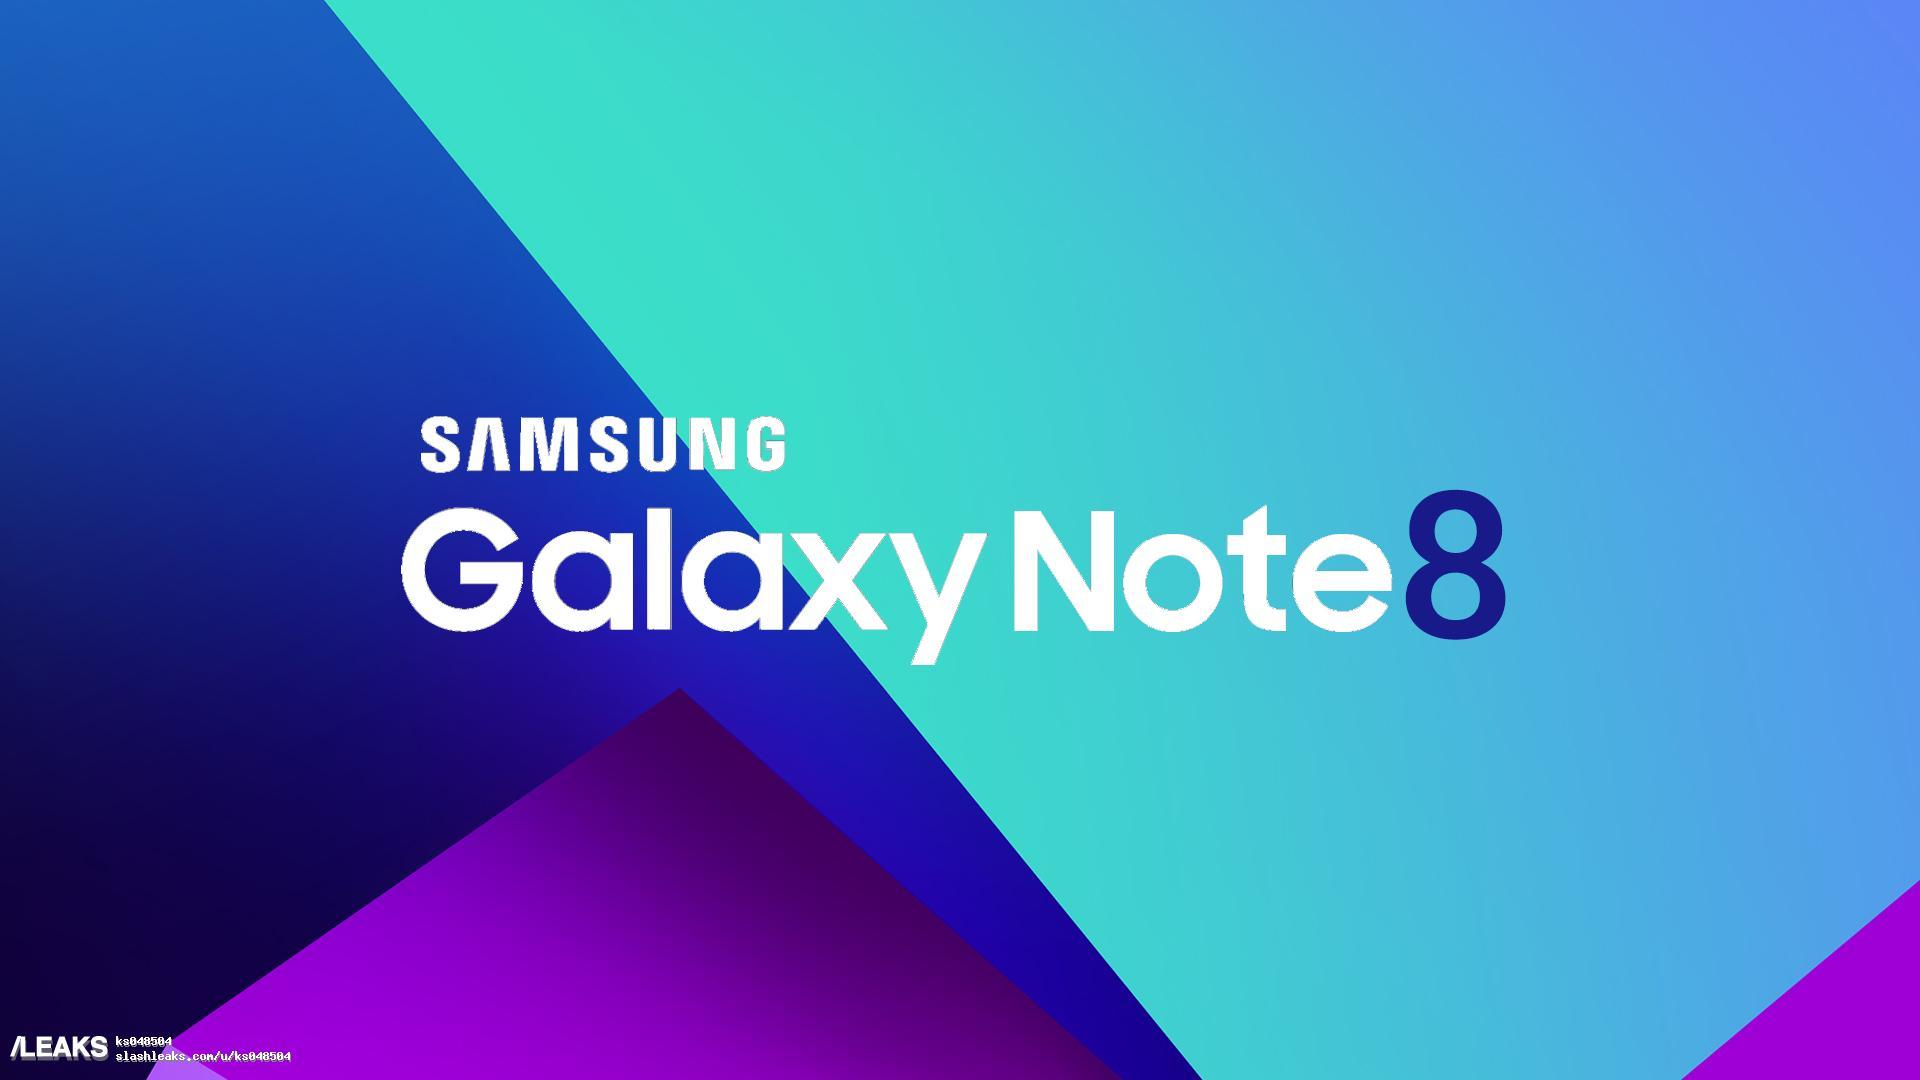 img Alleged Note 8 Branding